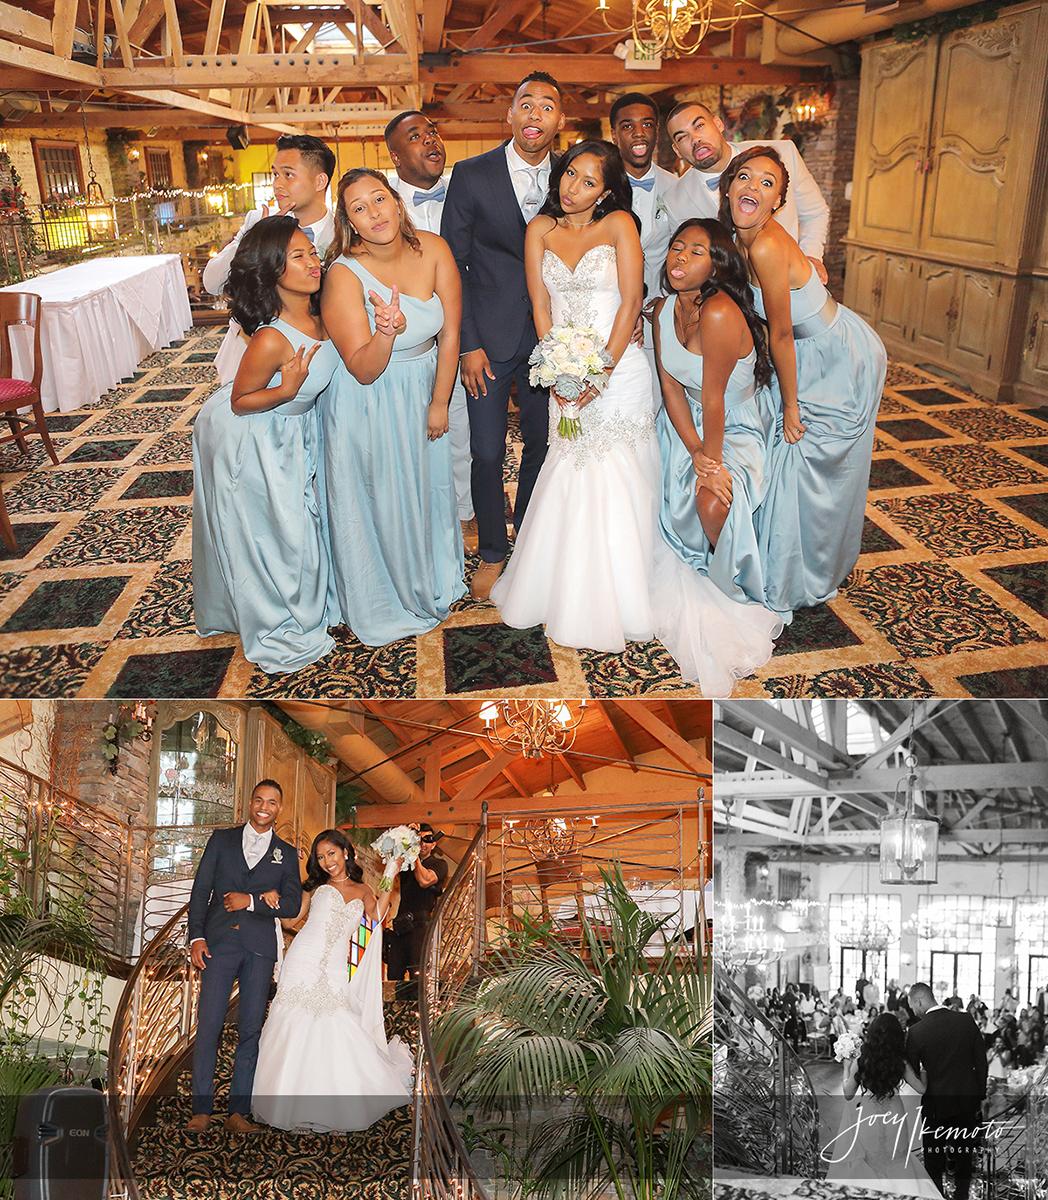 wayfarers-chapel-and-micheals-tuscany-room-wedding_0049_blog-collage-1476916270395